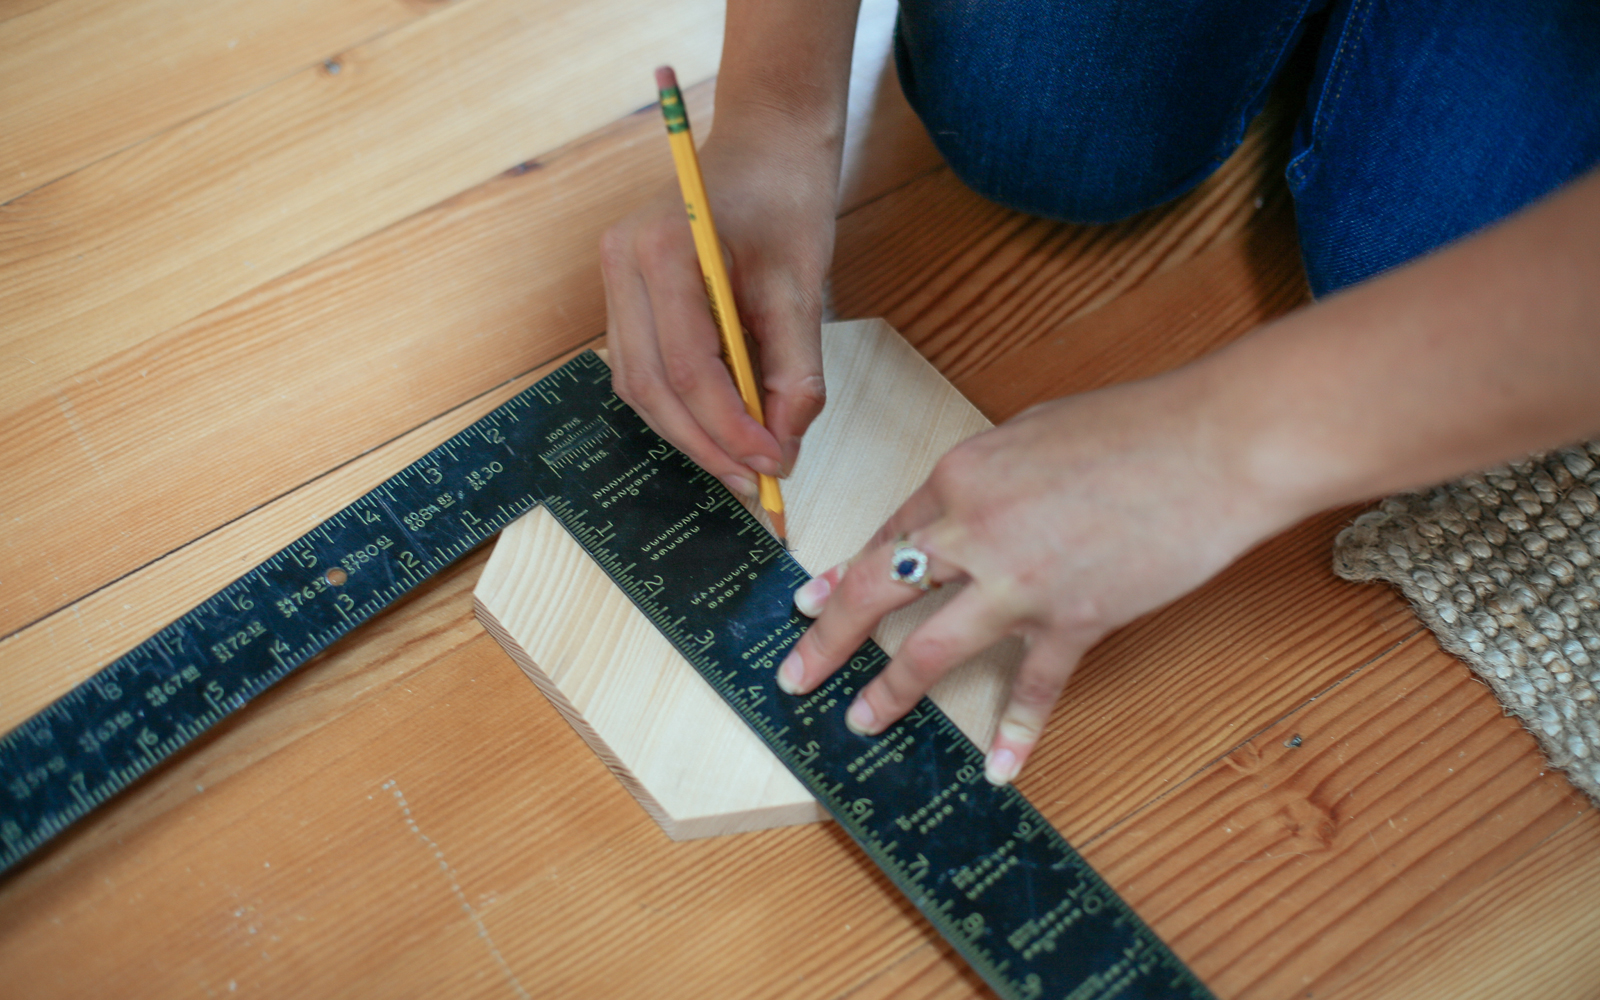 preparing to cut wood